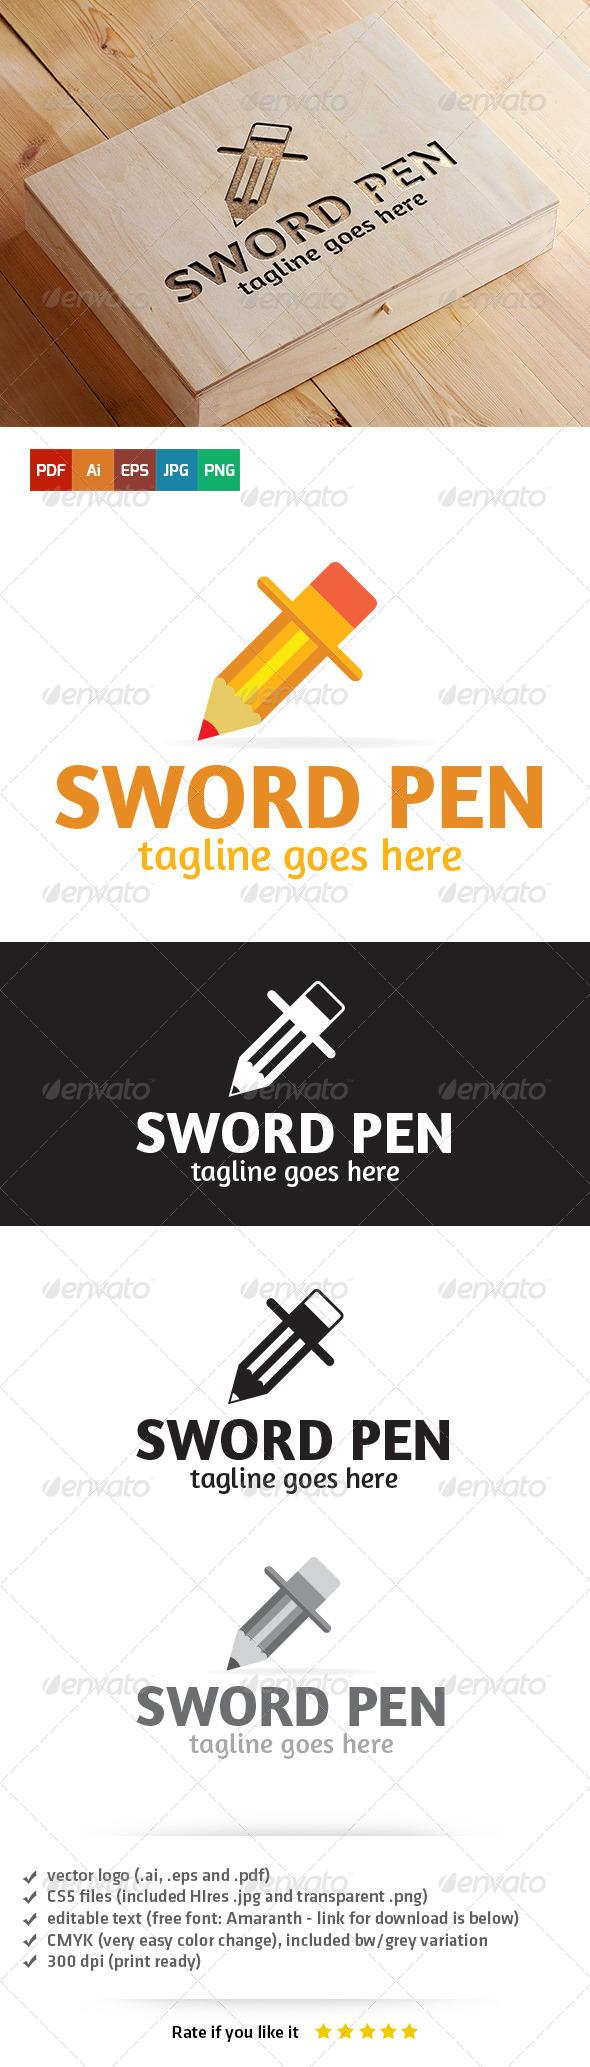 GraphicRiver Sword Pen Logo 5404526